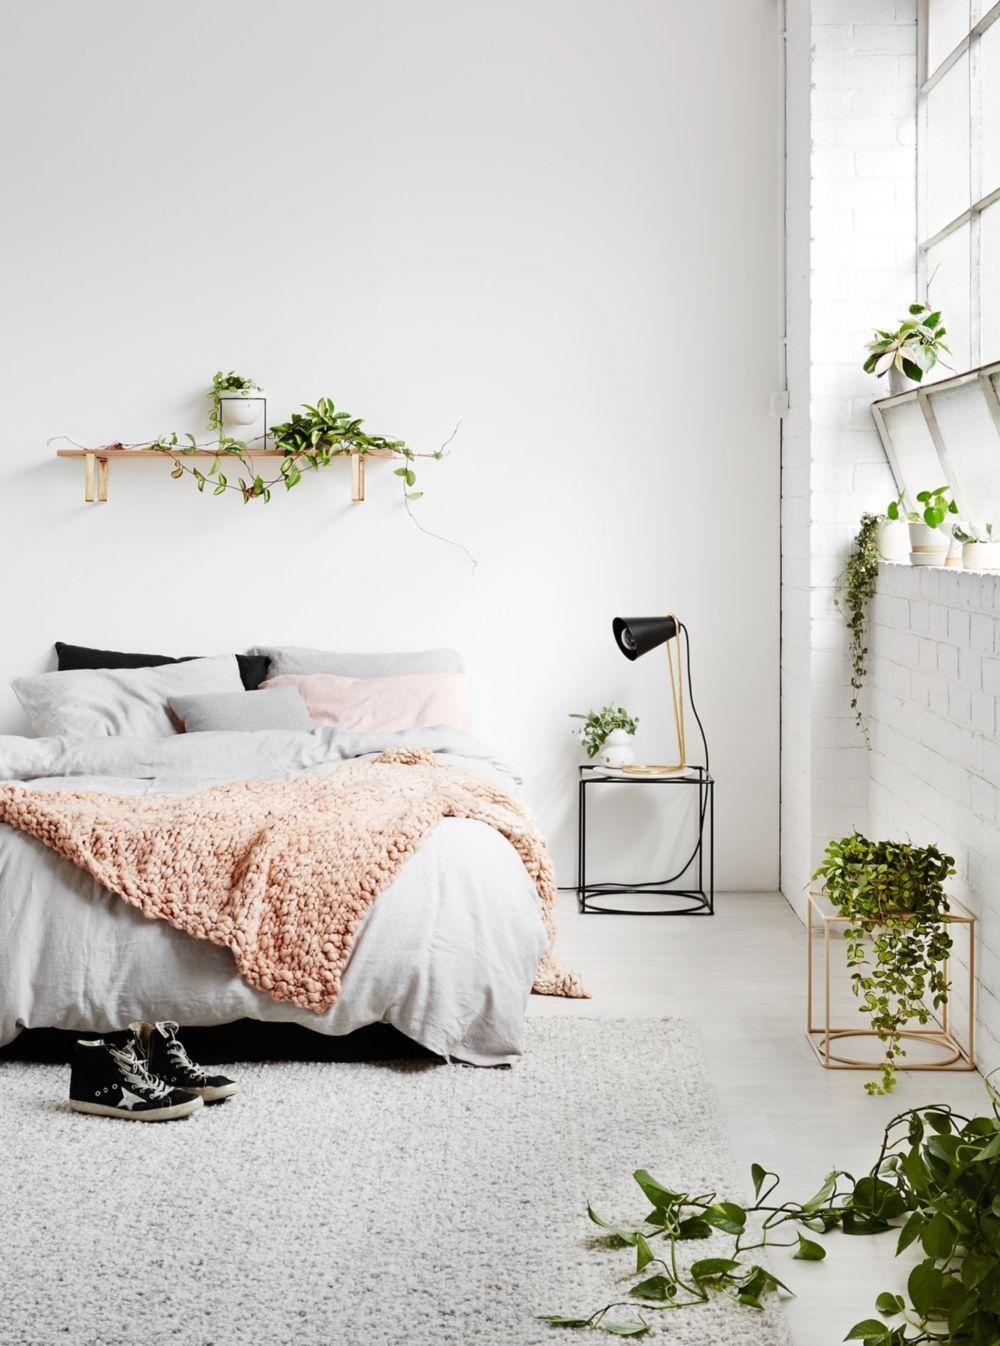 2017 06 calming bedroom colors - 50 Mind Blowing Minimalist Bedroom Color Inspiration